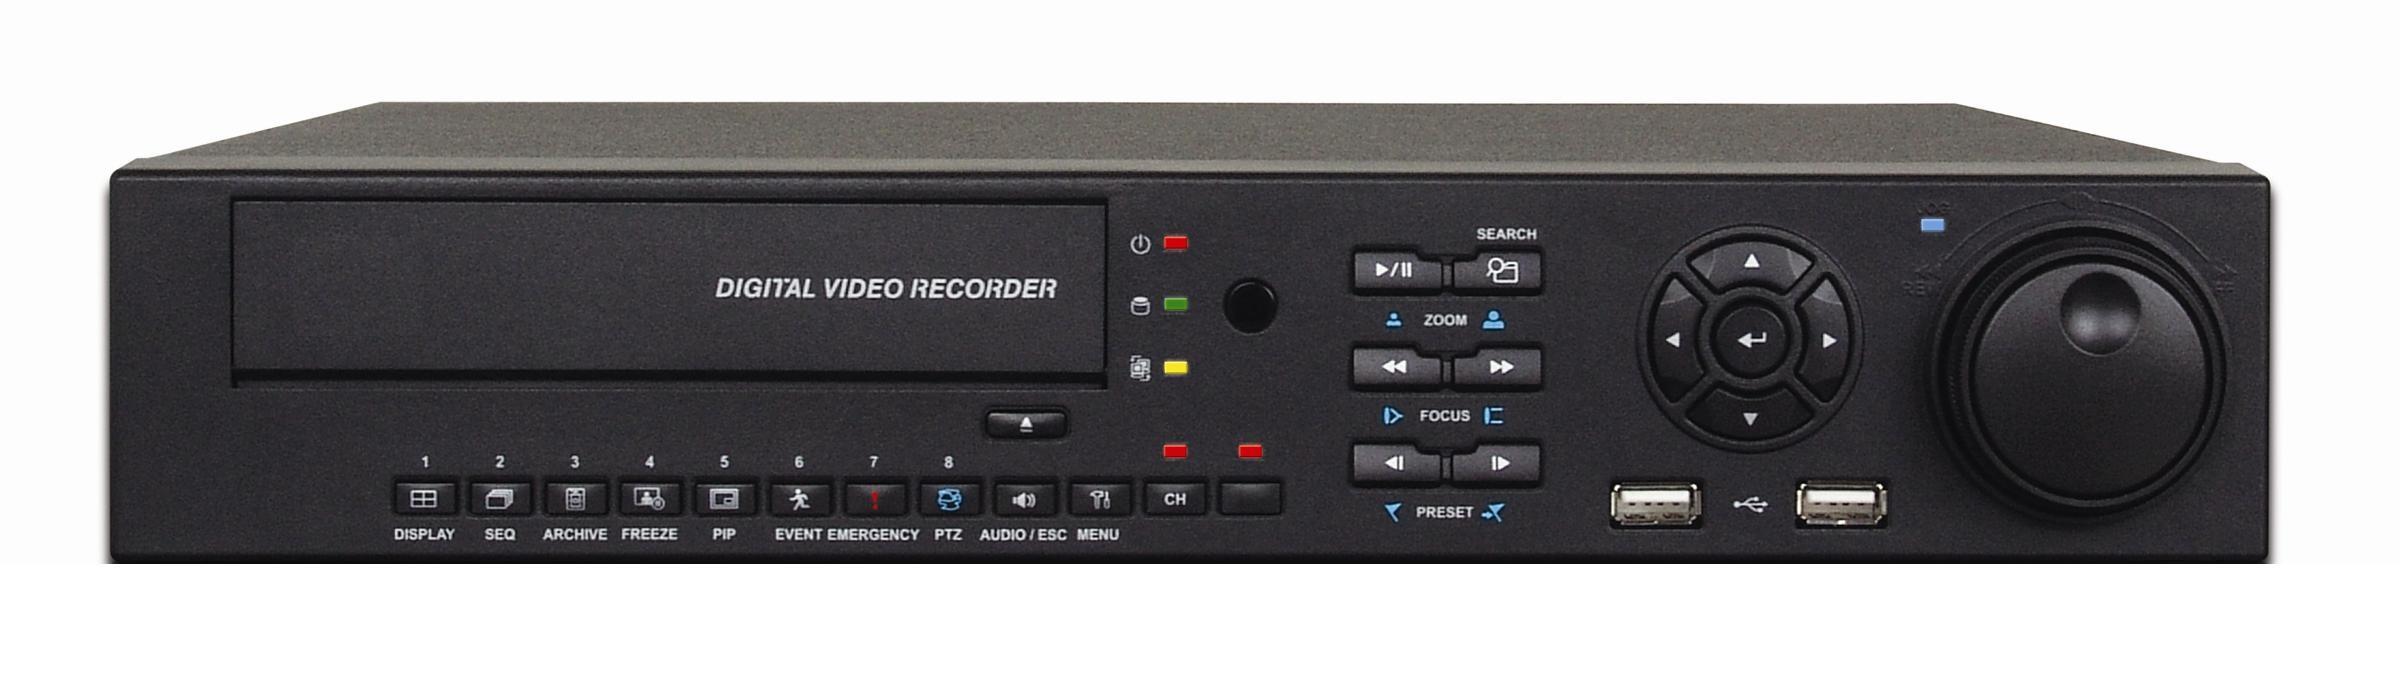 Visage HSDVR8-500